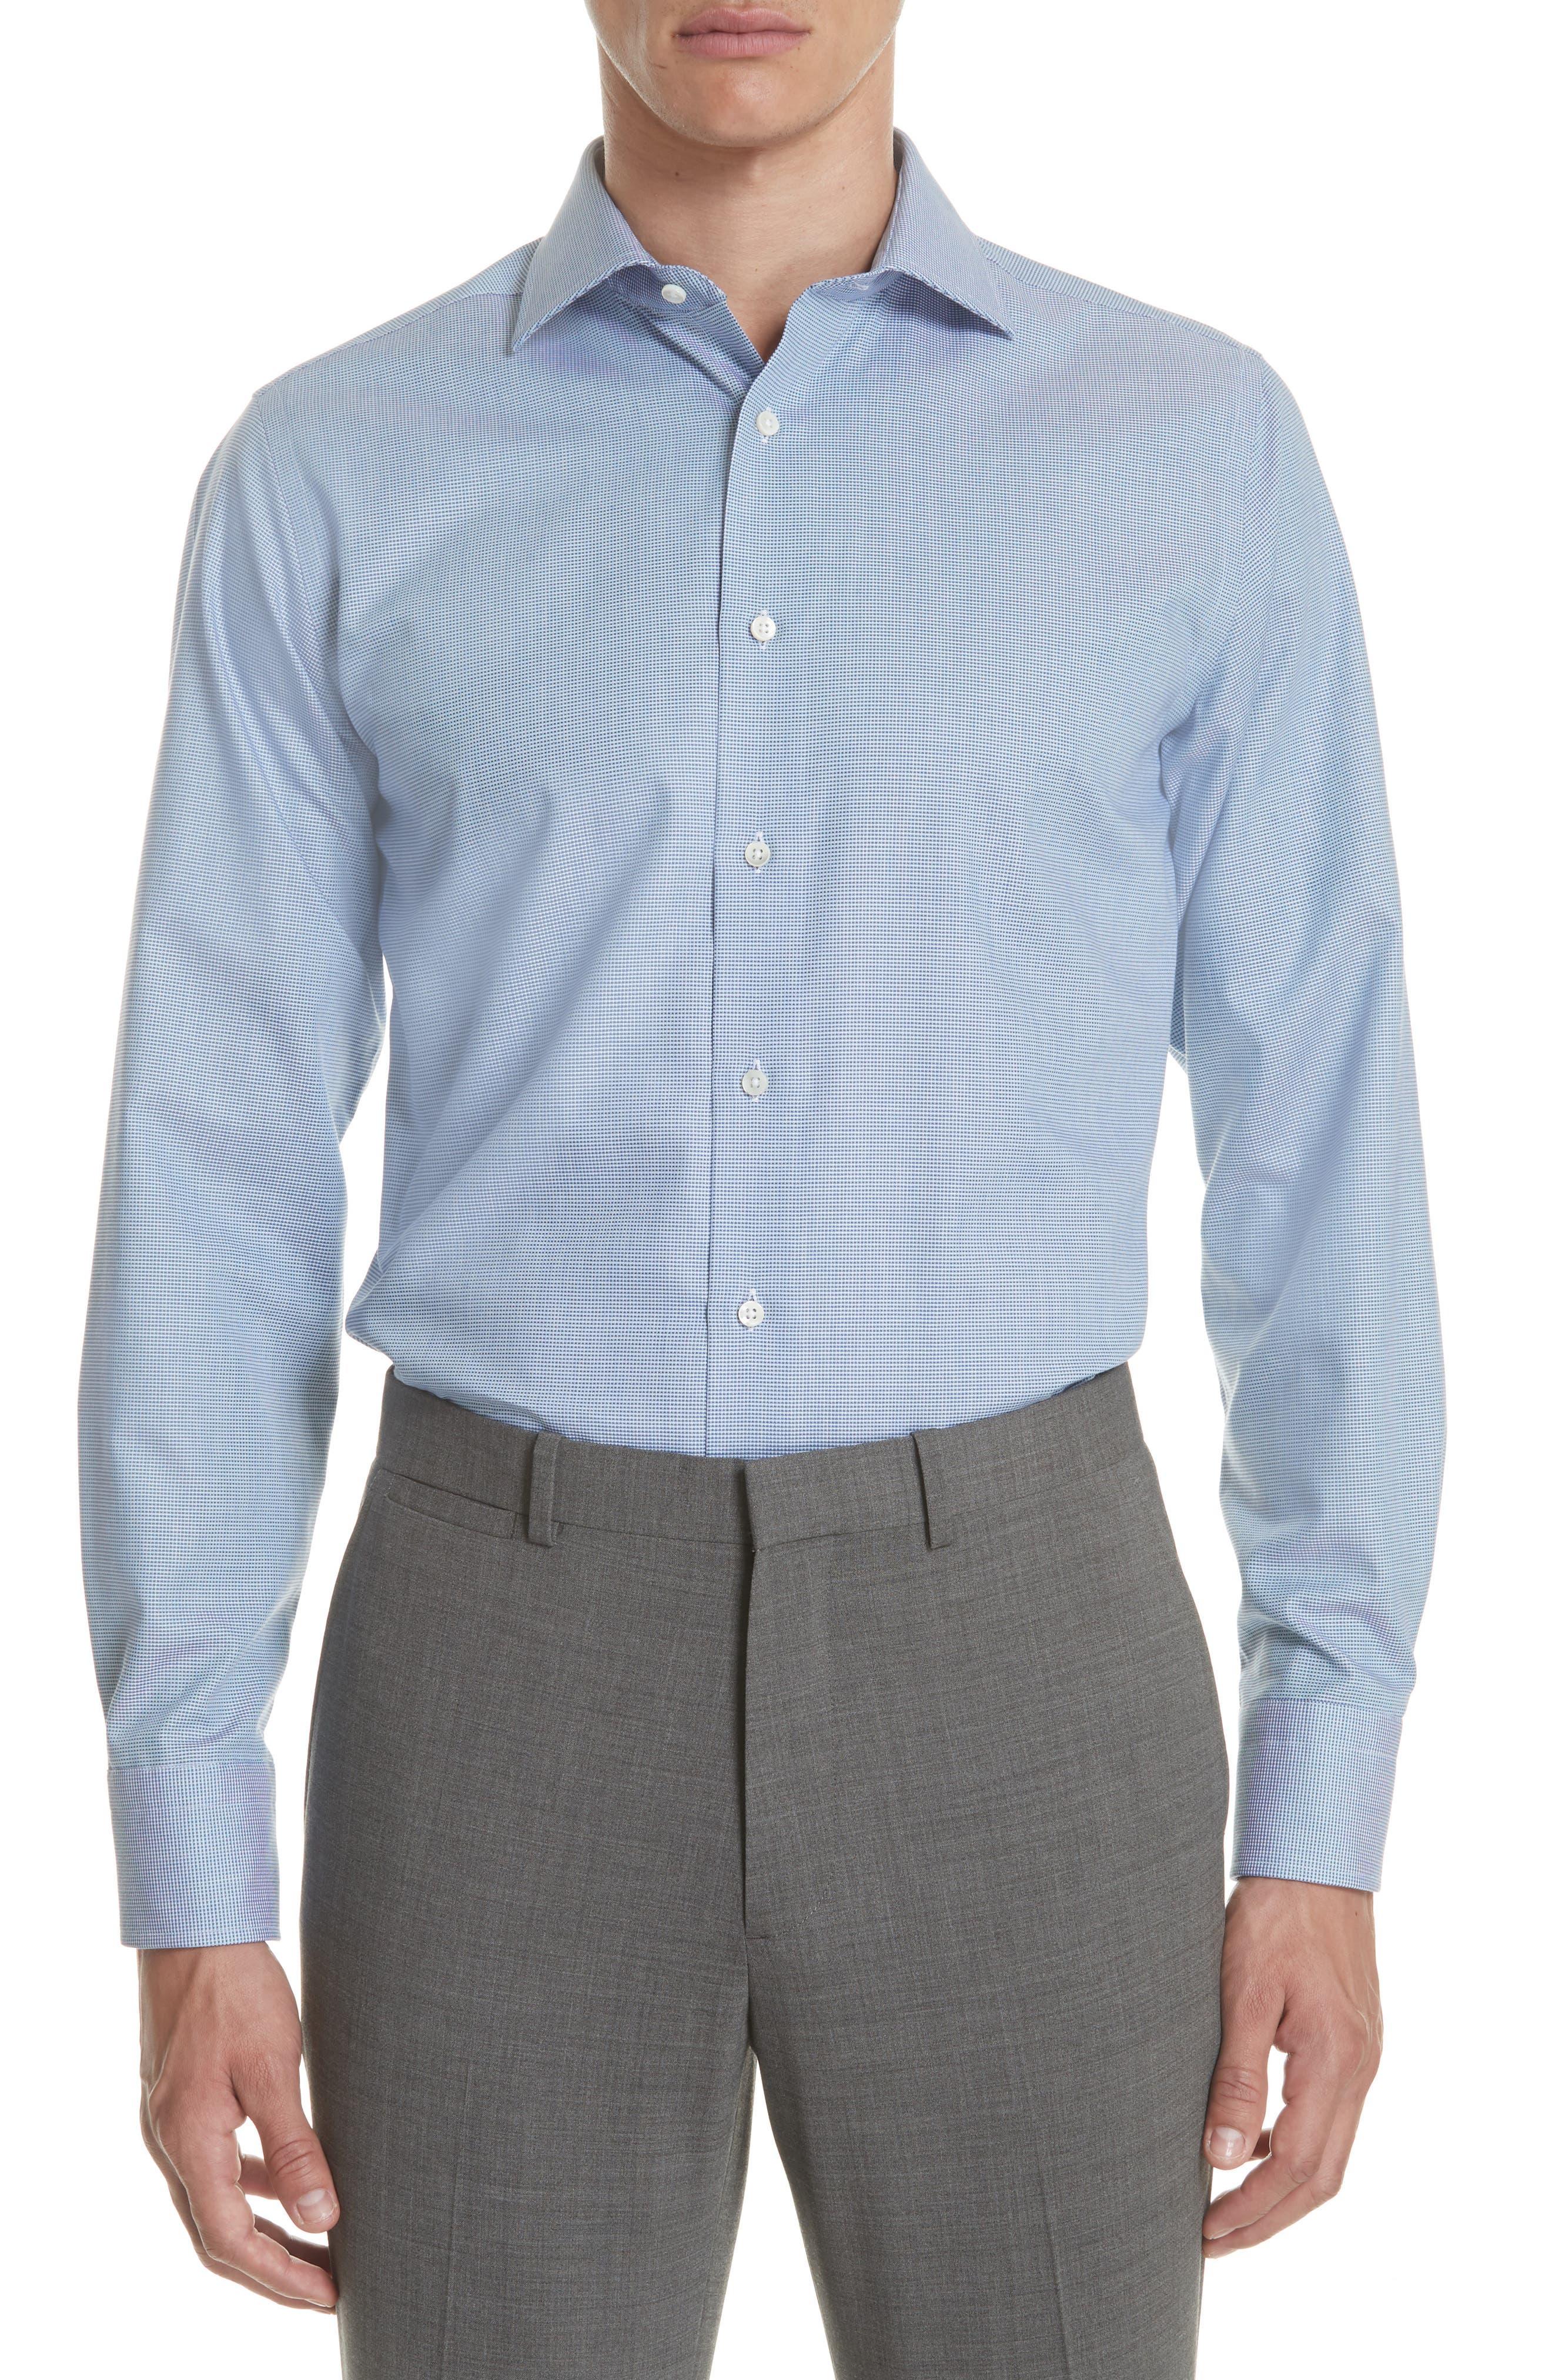 Regular Fit Solid Dress Shirt,                             Main thumbnail 1, color,                             401